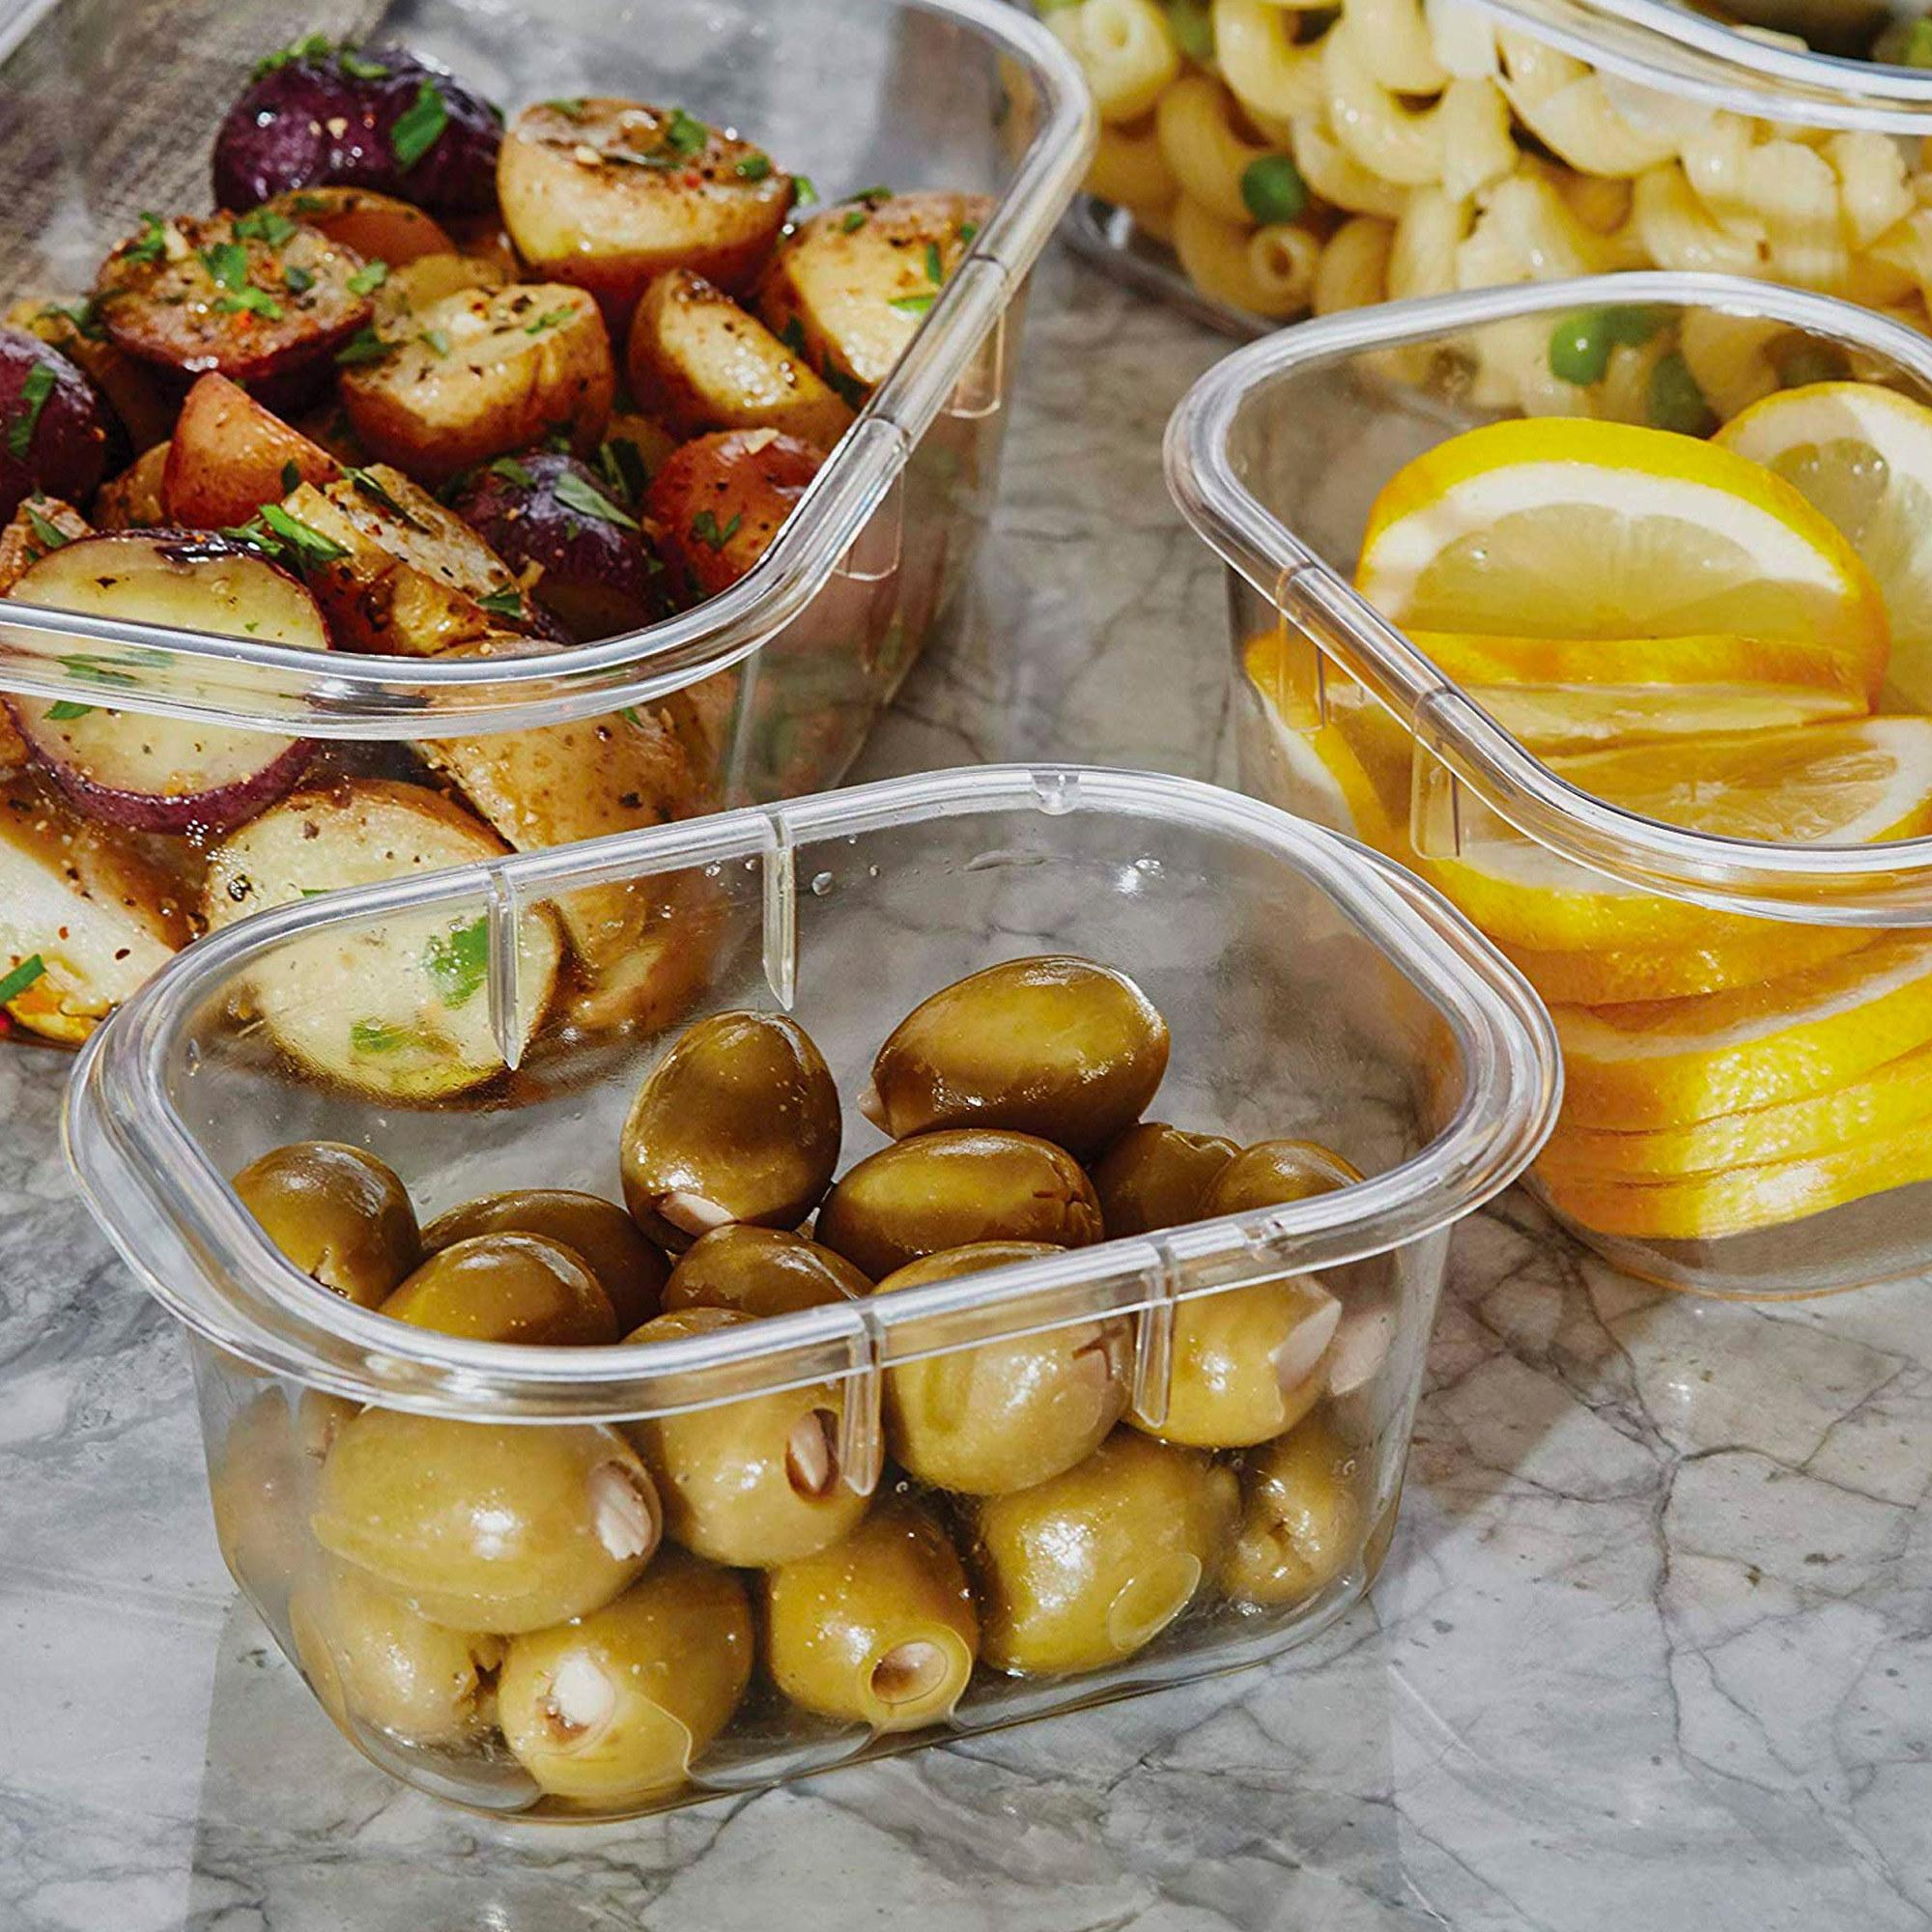 The glass food storage set